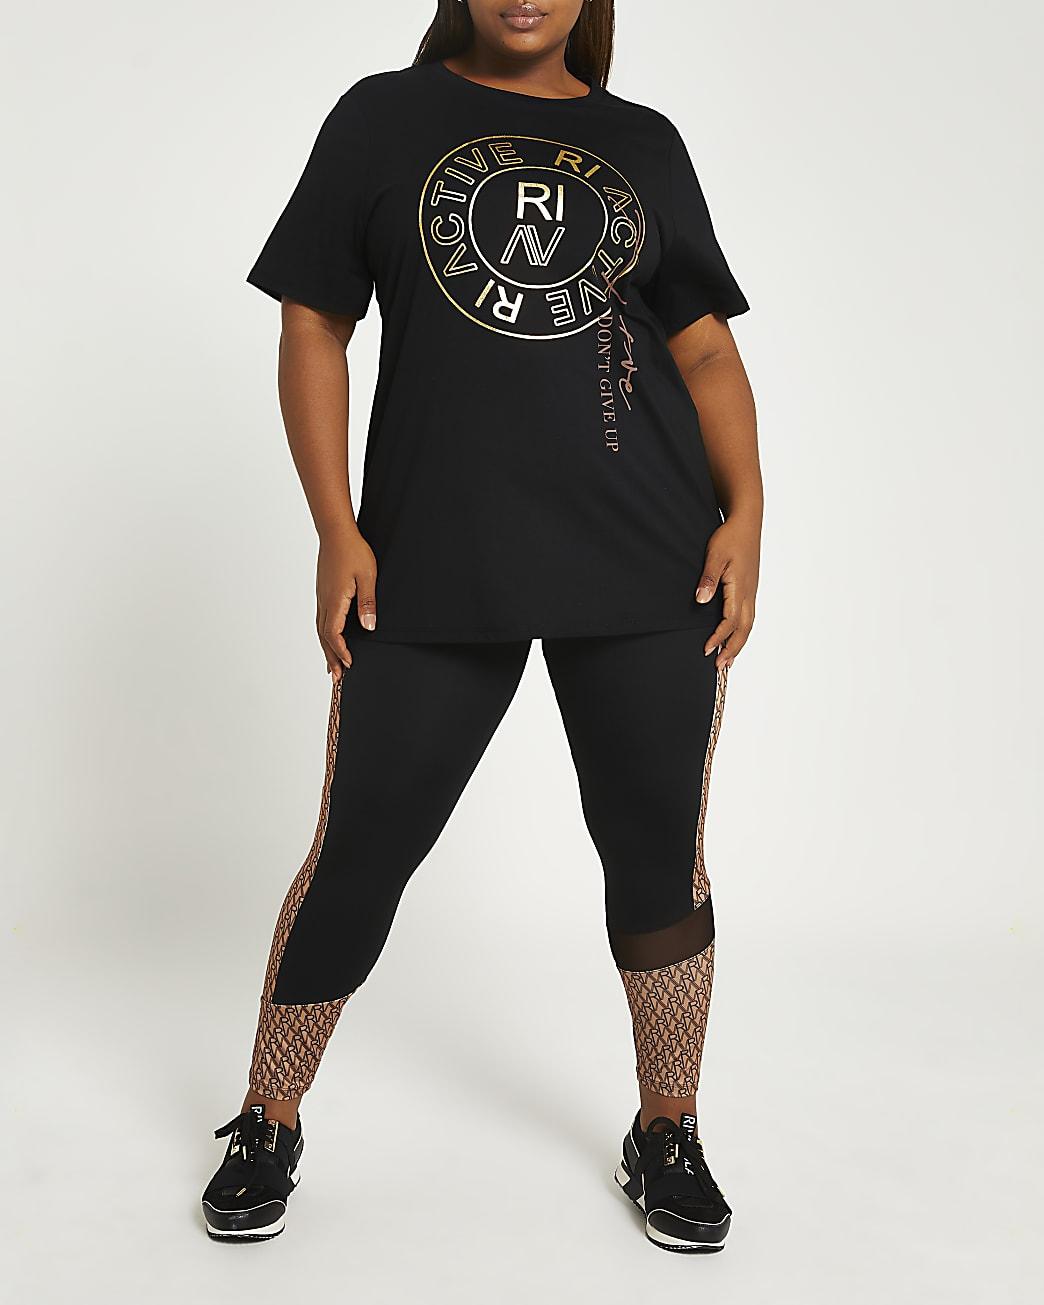 Plus black RI Active t-shirt